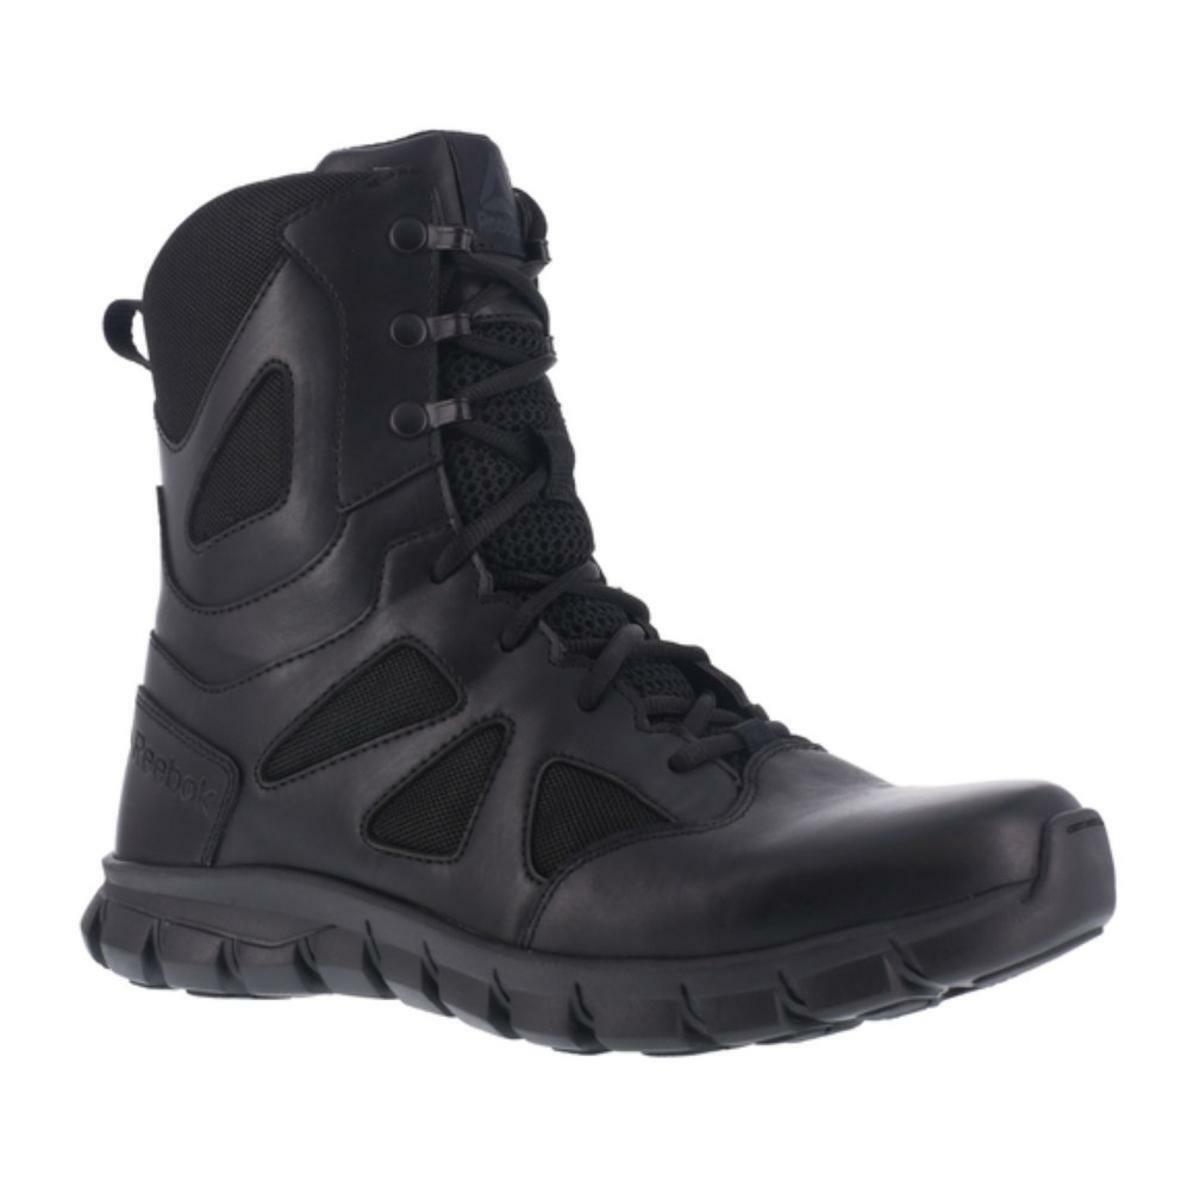 Reebok Para Hombre botas Negras homónima Cojín táctica 8  - RB8805